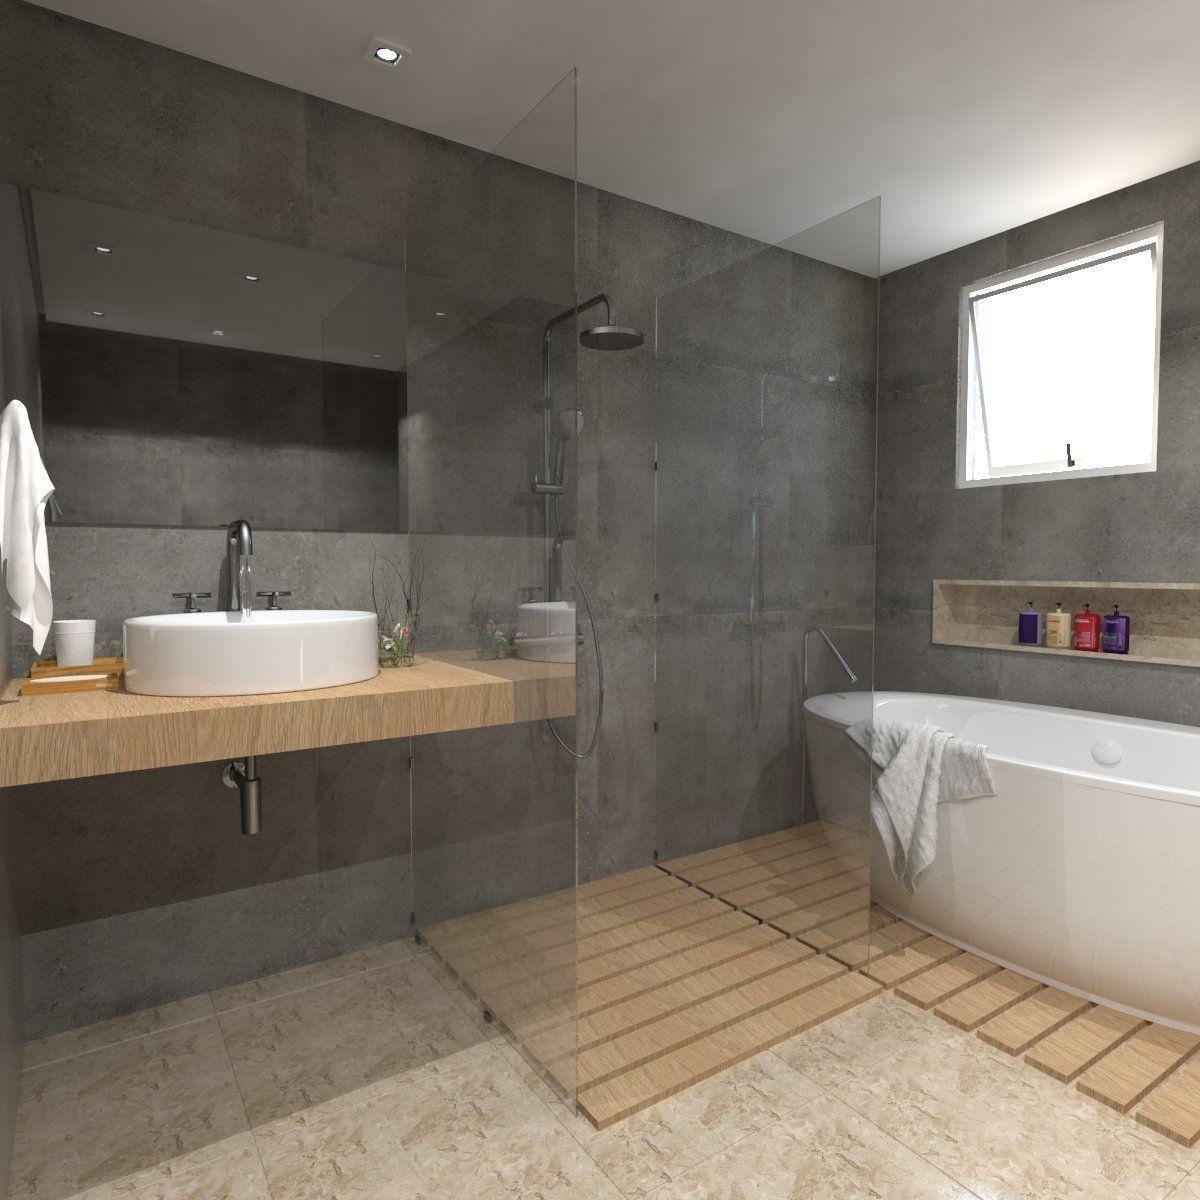 detailed bathroom | 3D model in 2020 | Small bathroom ...